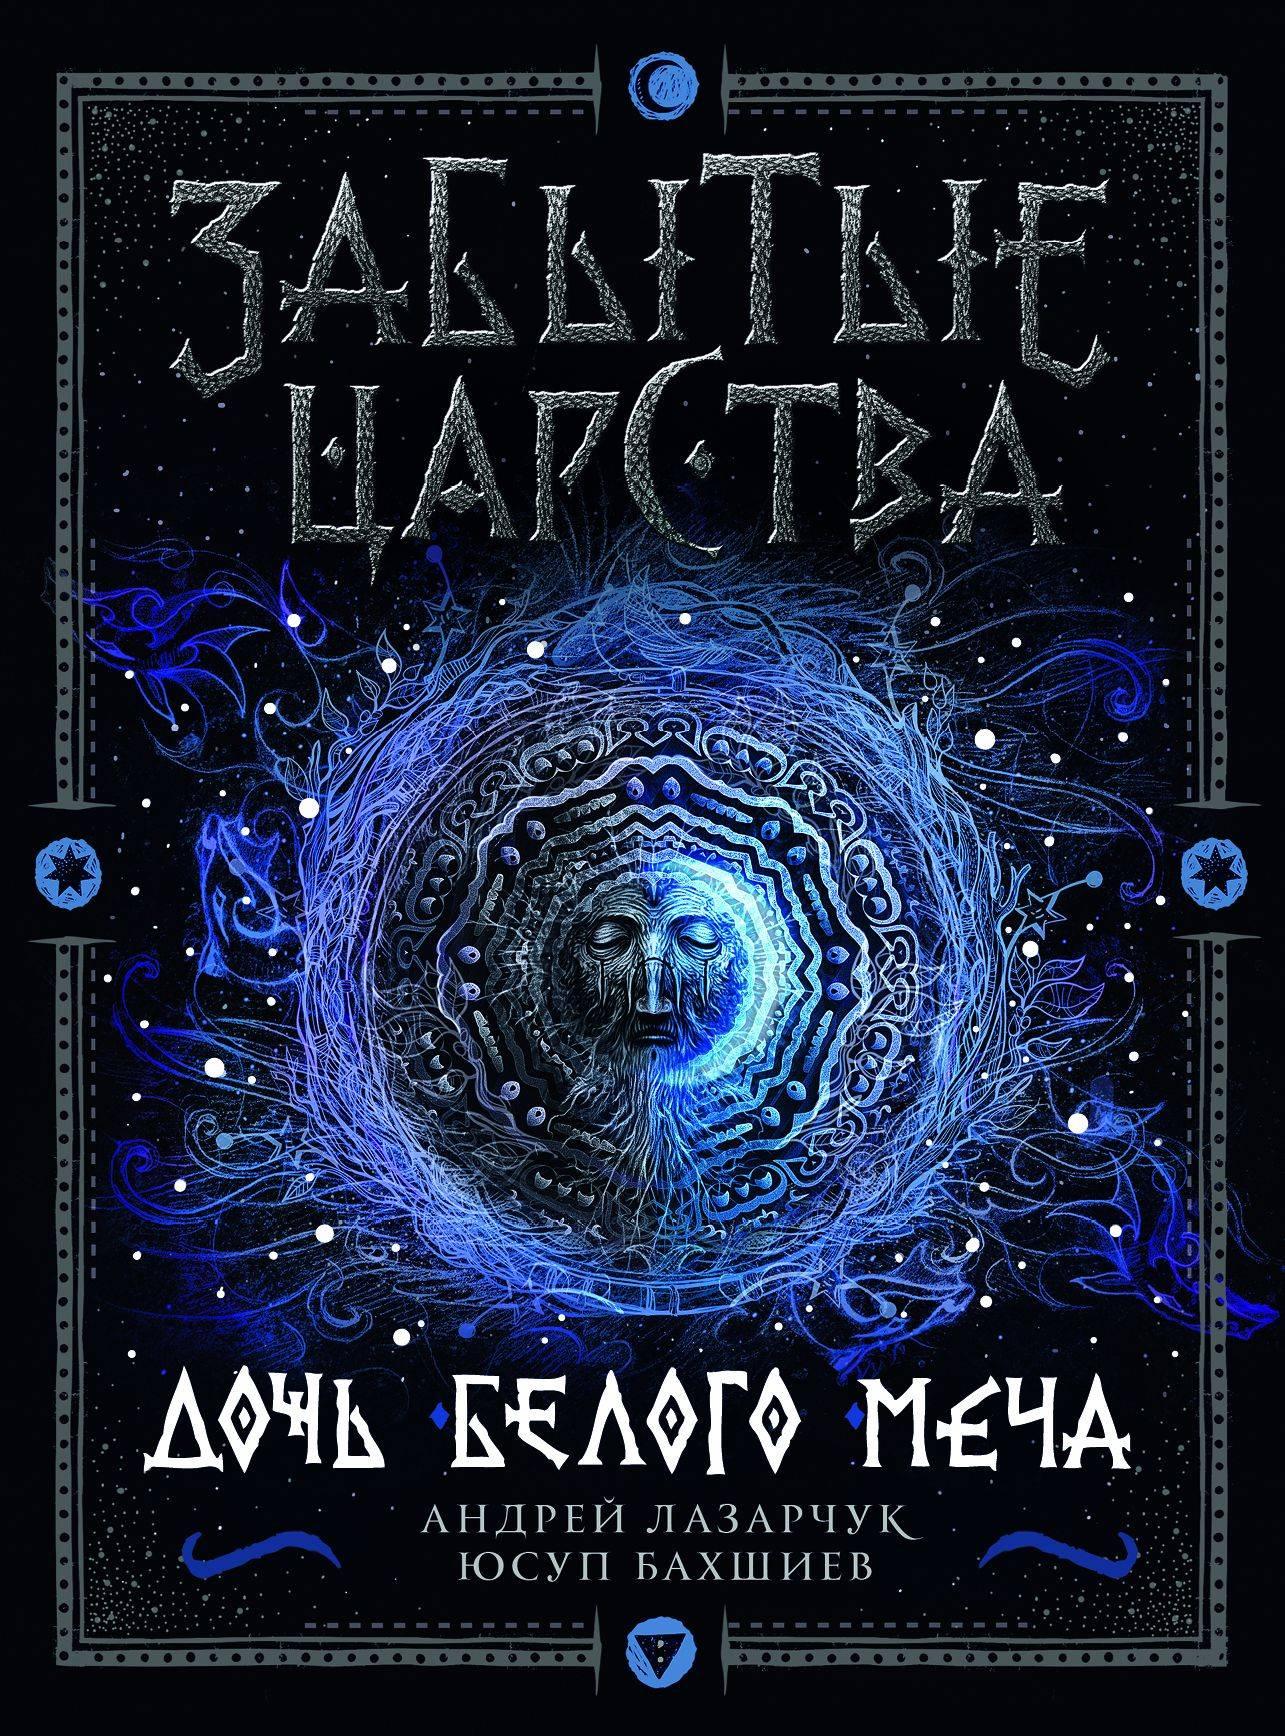 Андрей Лазарчук, Юсуп Бахшиев «Дочь Белого Меча»